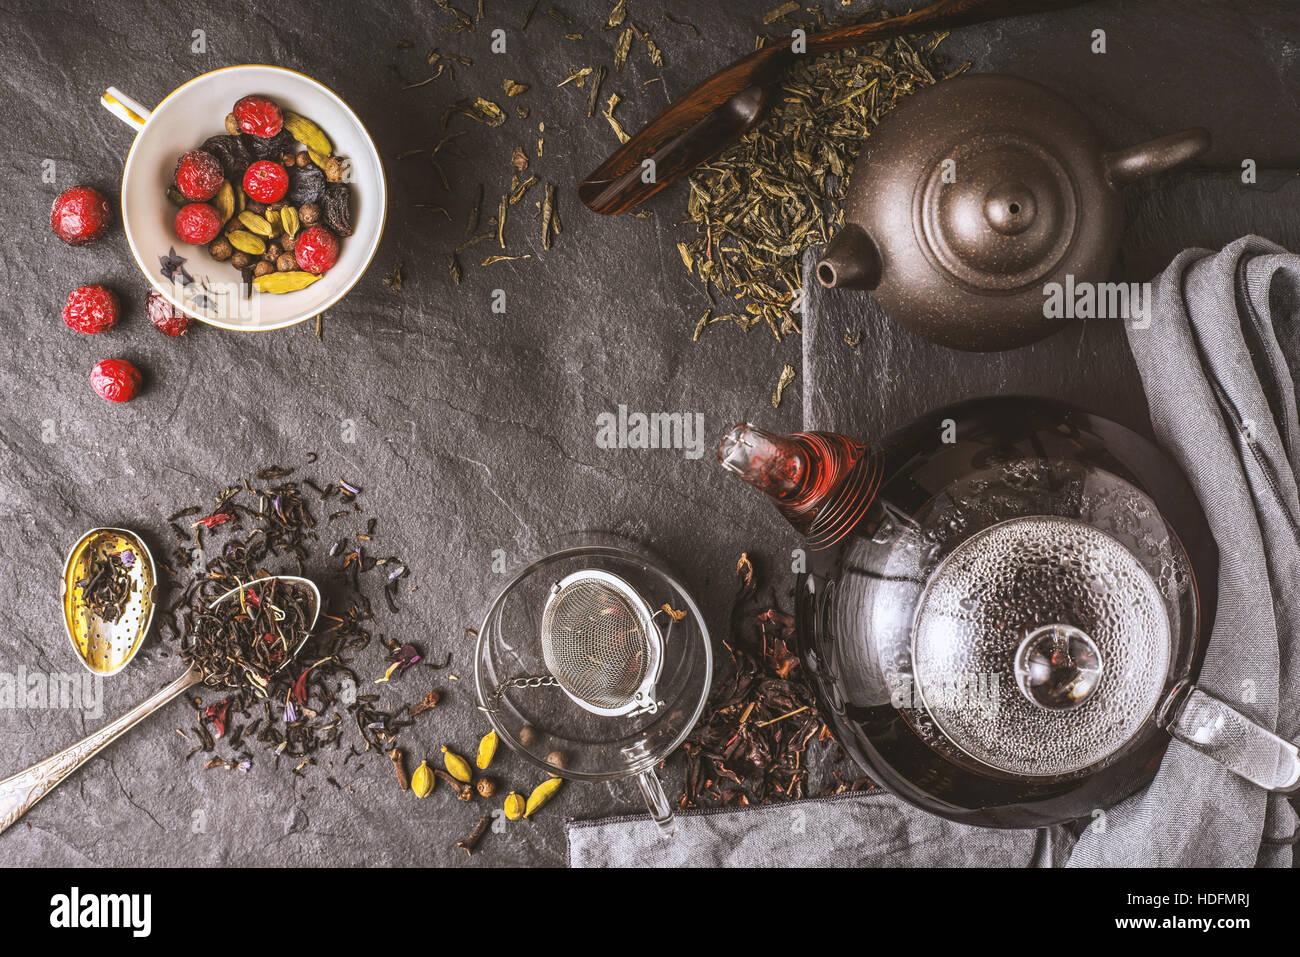 Tea diversity concept top view - Stock Image